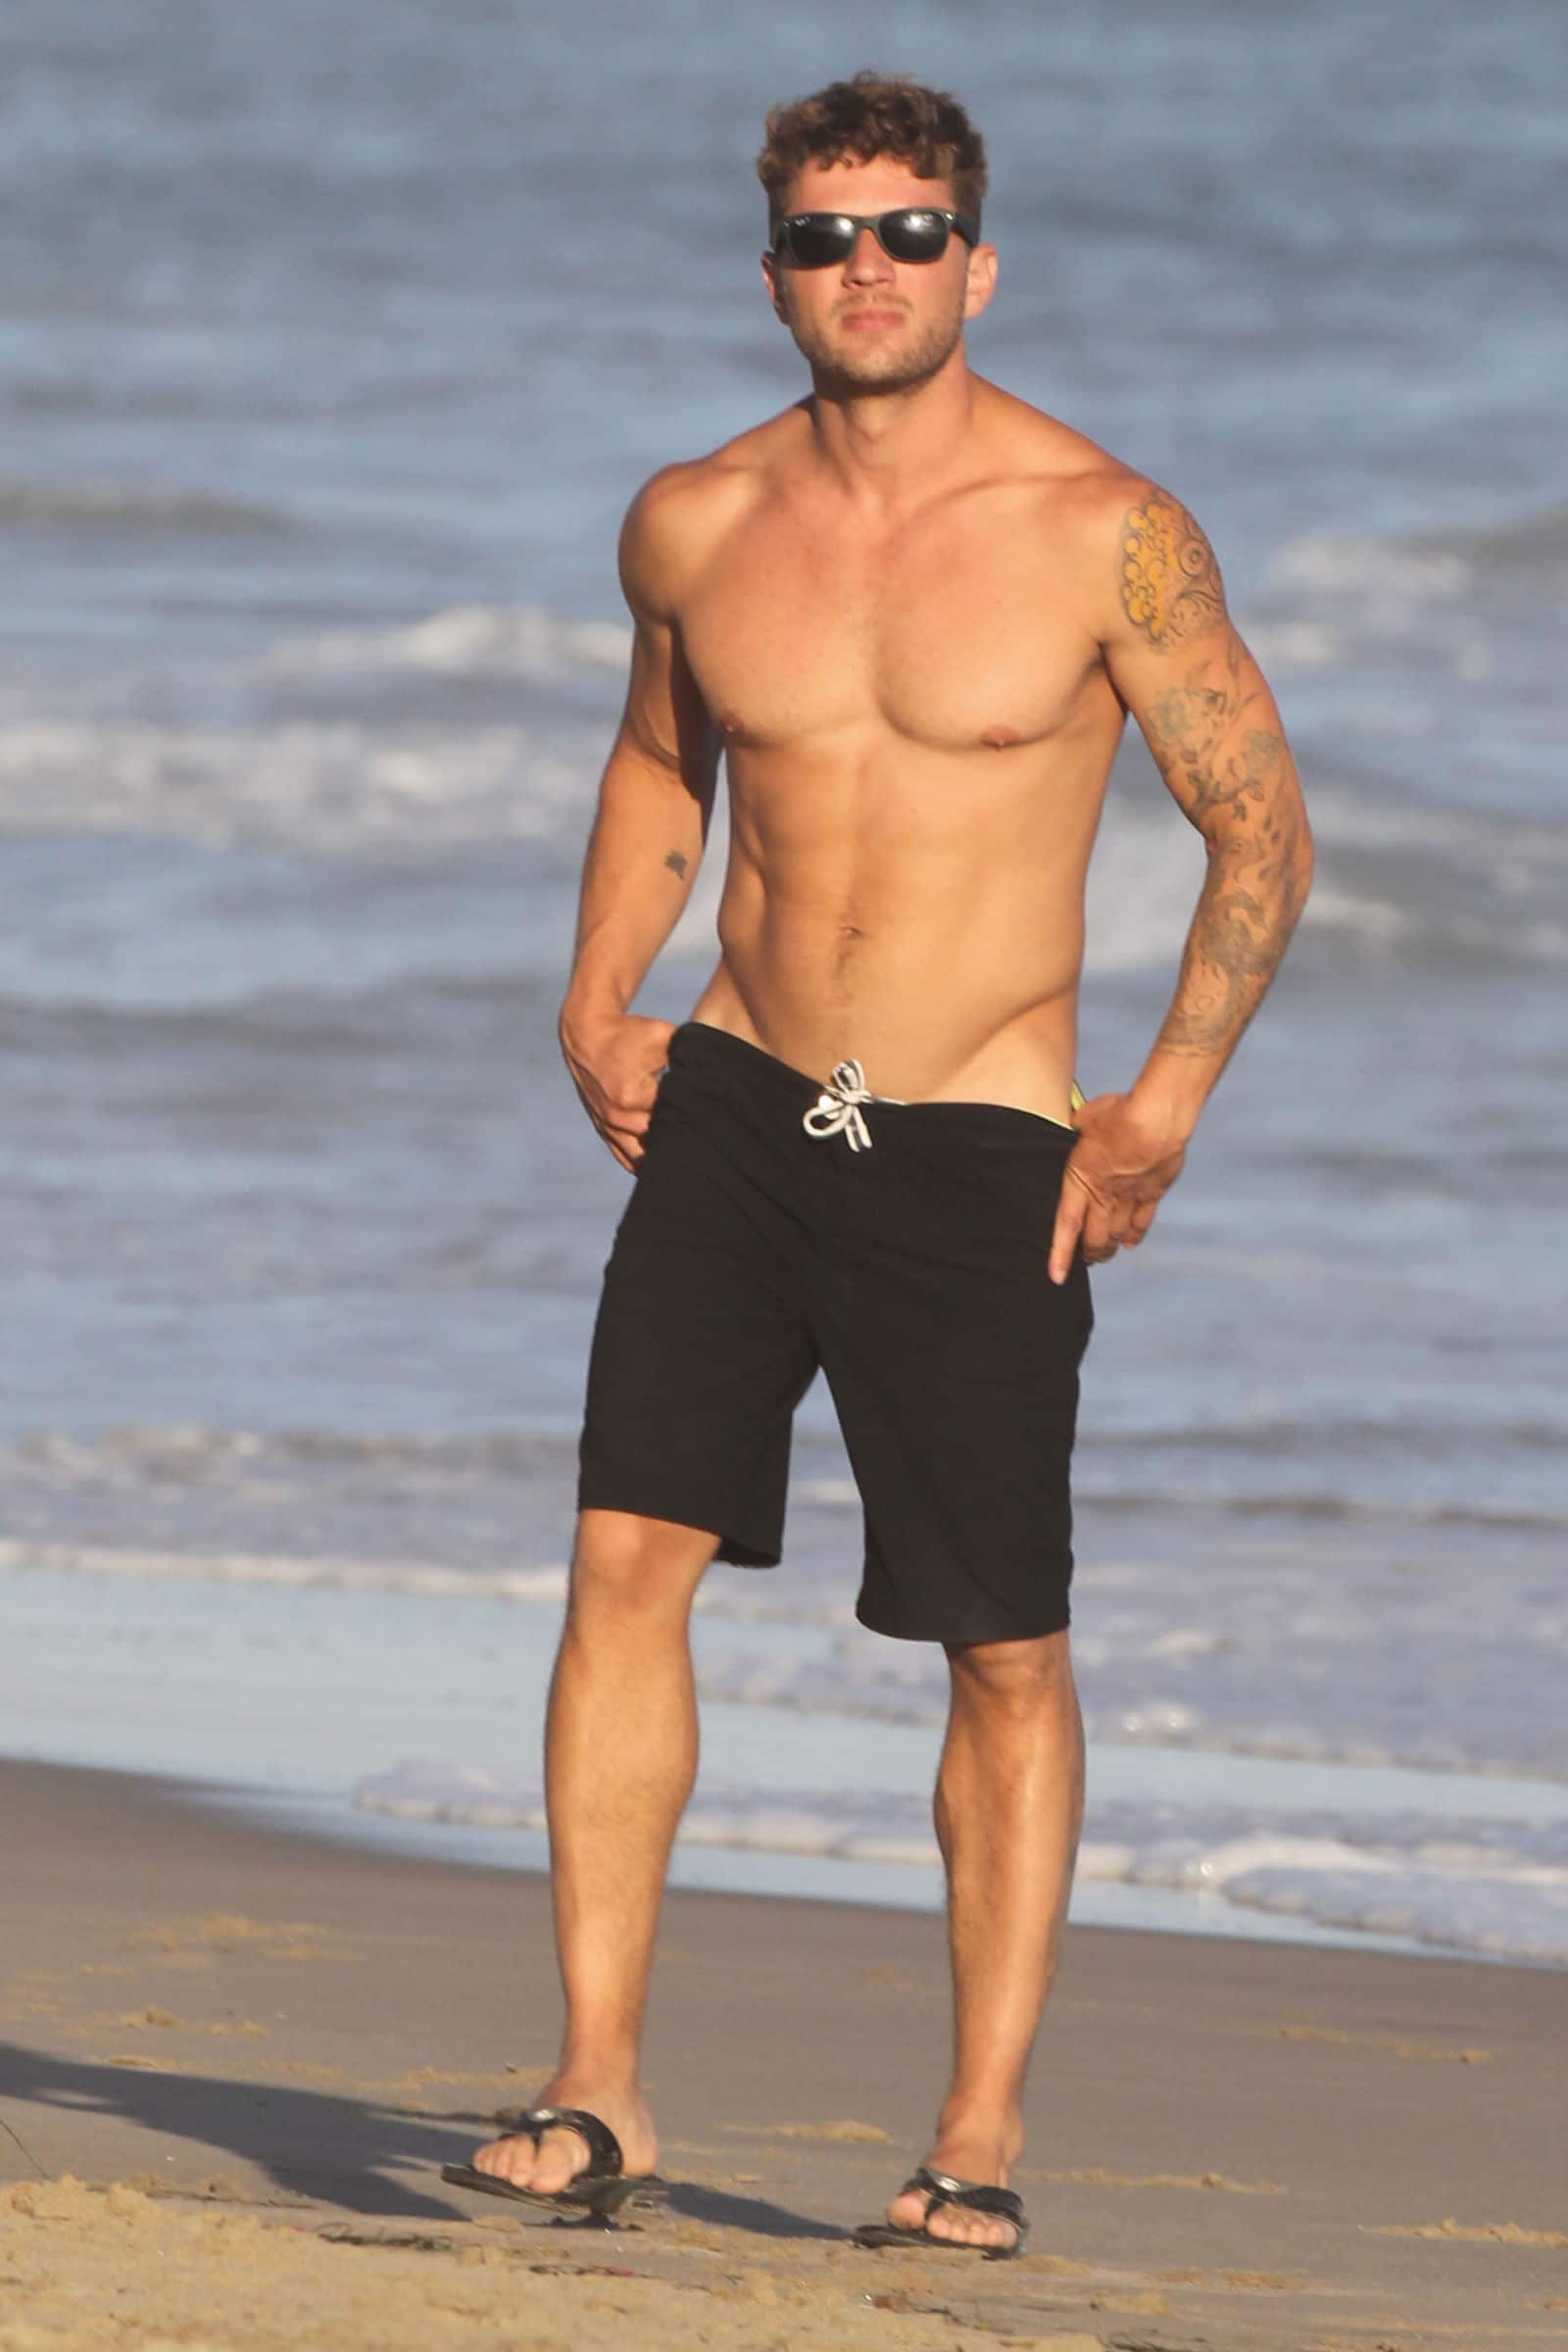 Ryan Phillippe naked shirtless pics (3)